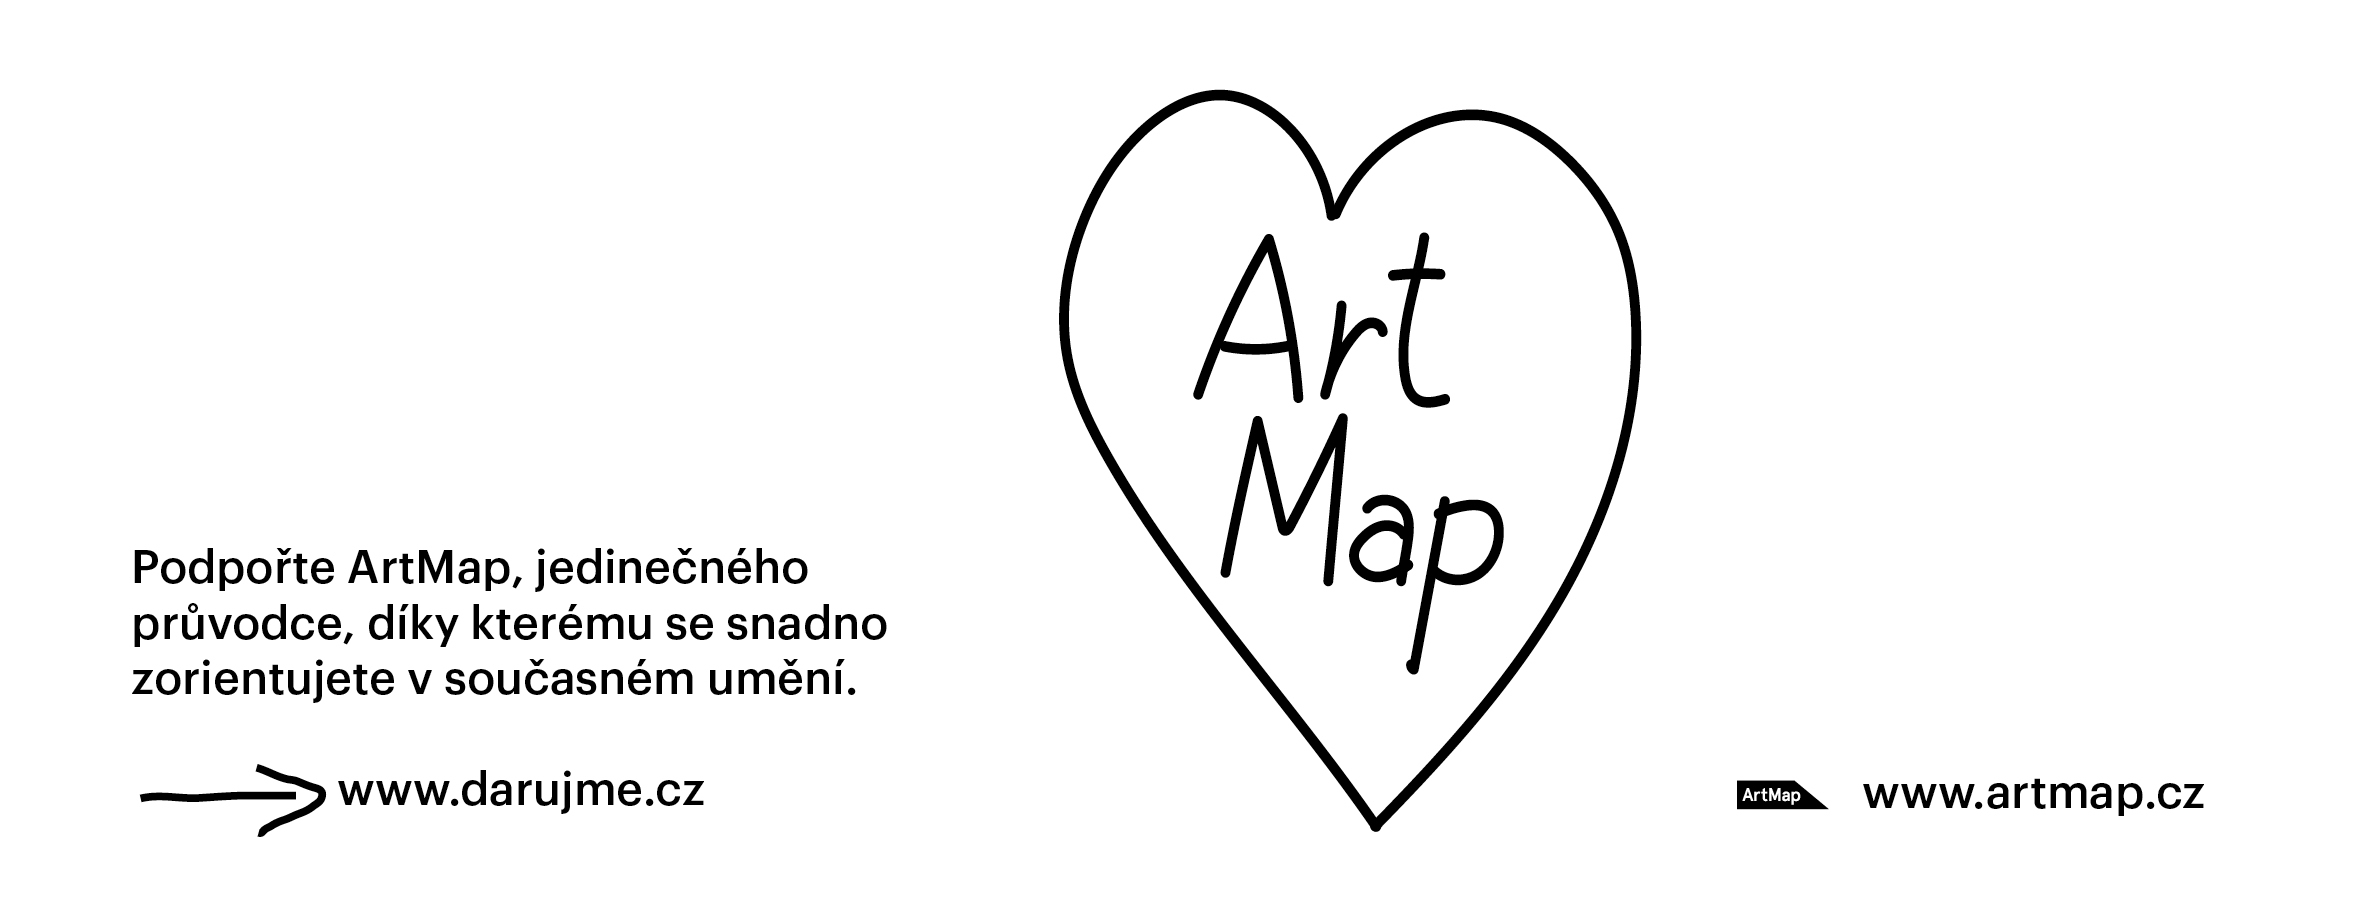 Podpořte ArtMap kampaň